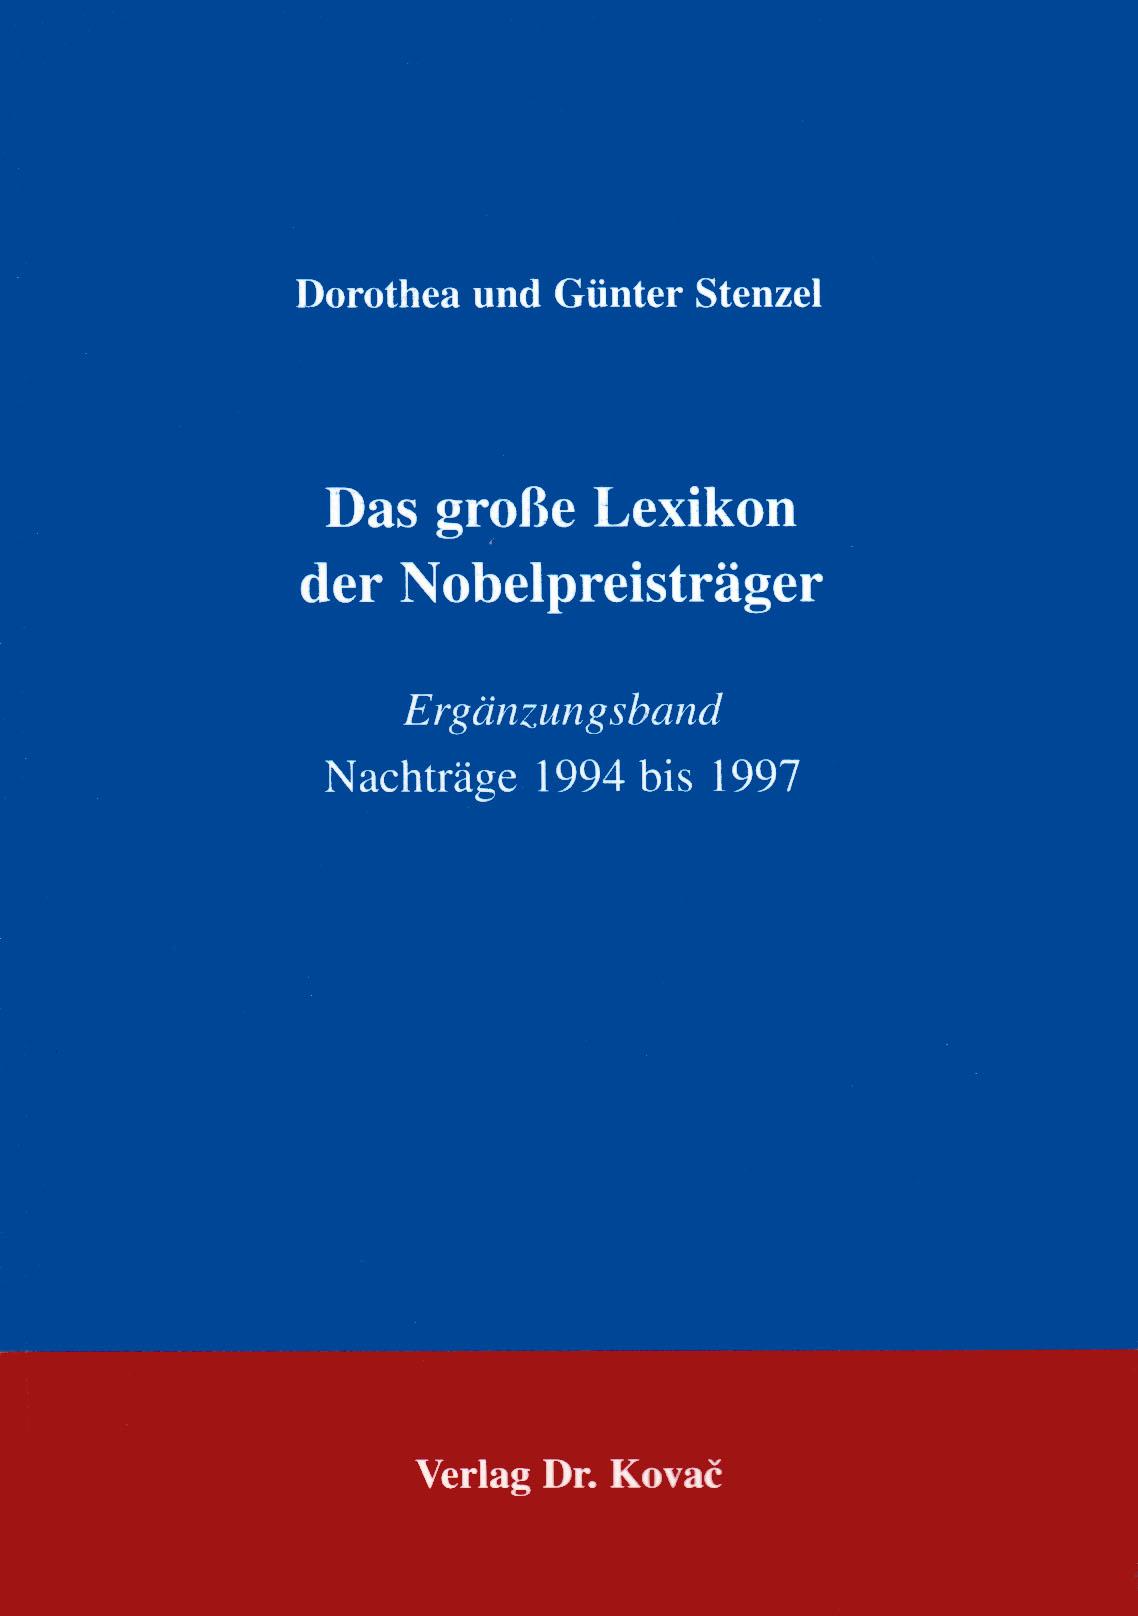 Cover: Das große Lexikon der Nobelpreisträger, Ergänzungsband